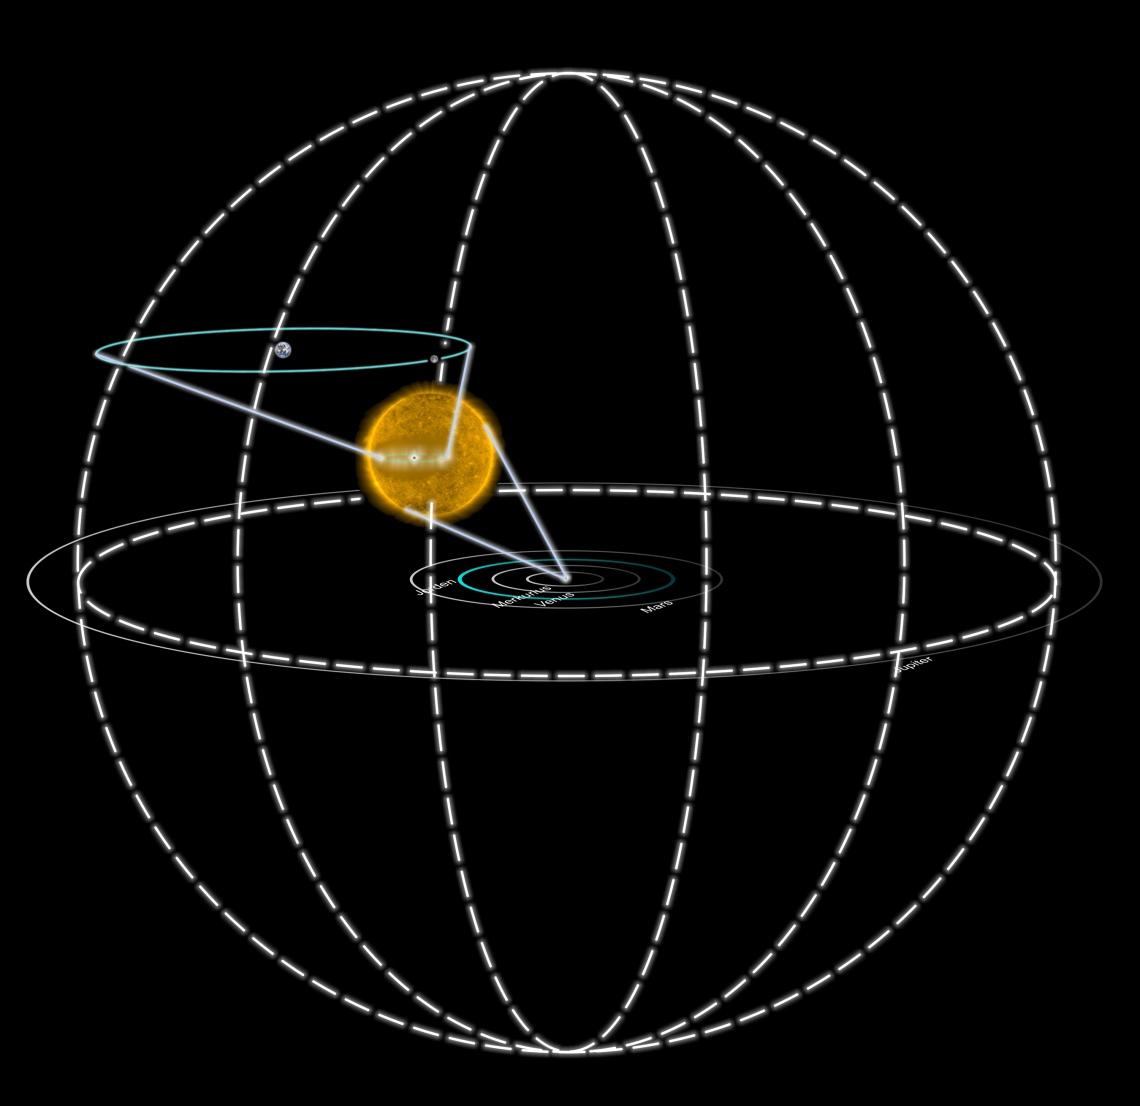 Jorden_Betelgeuse_storlek3